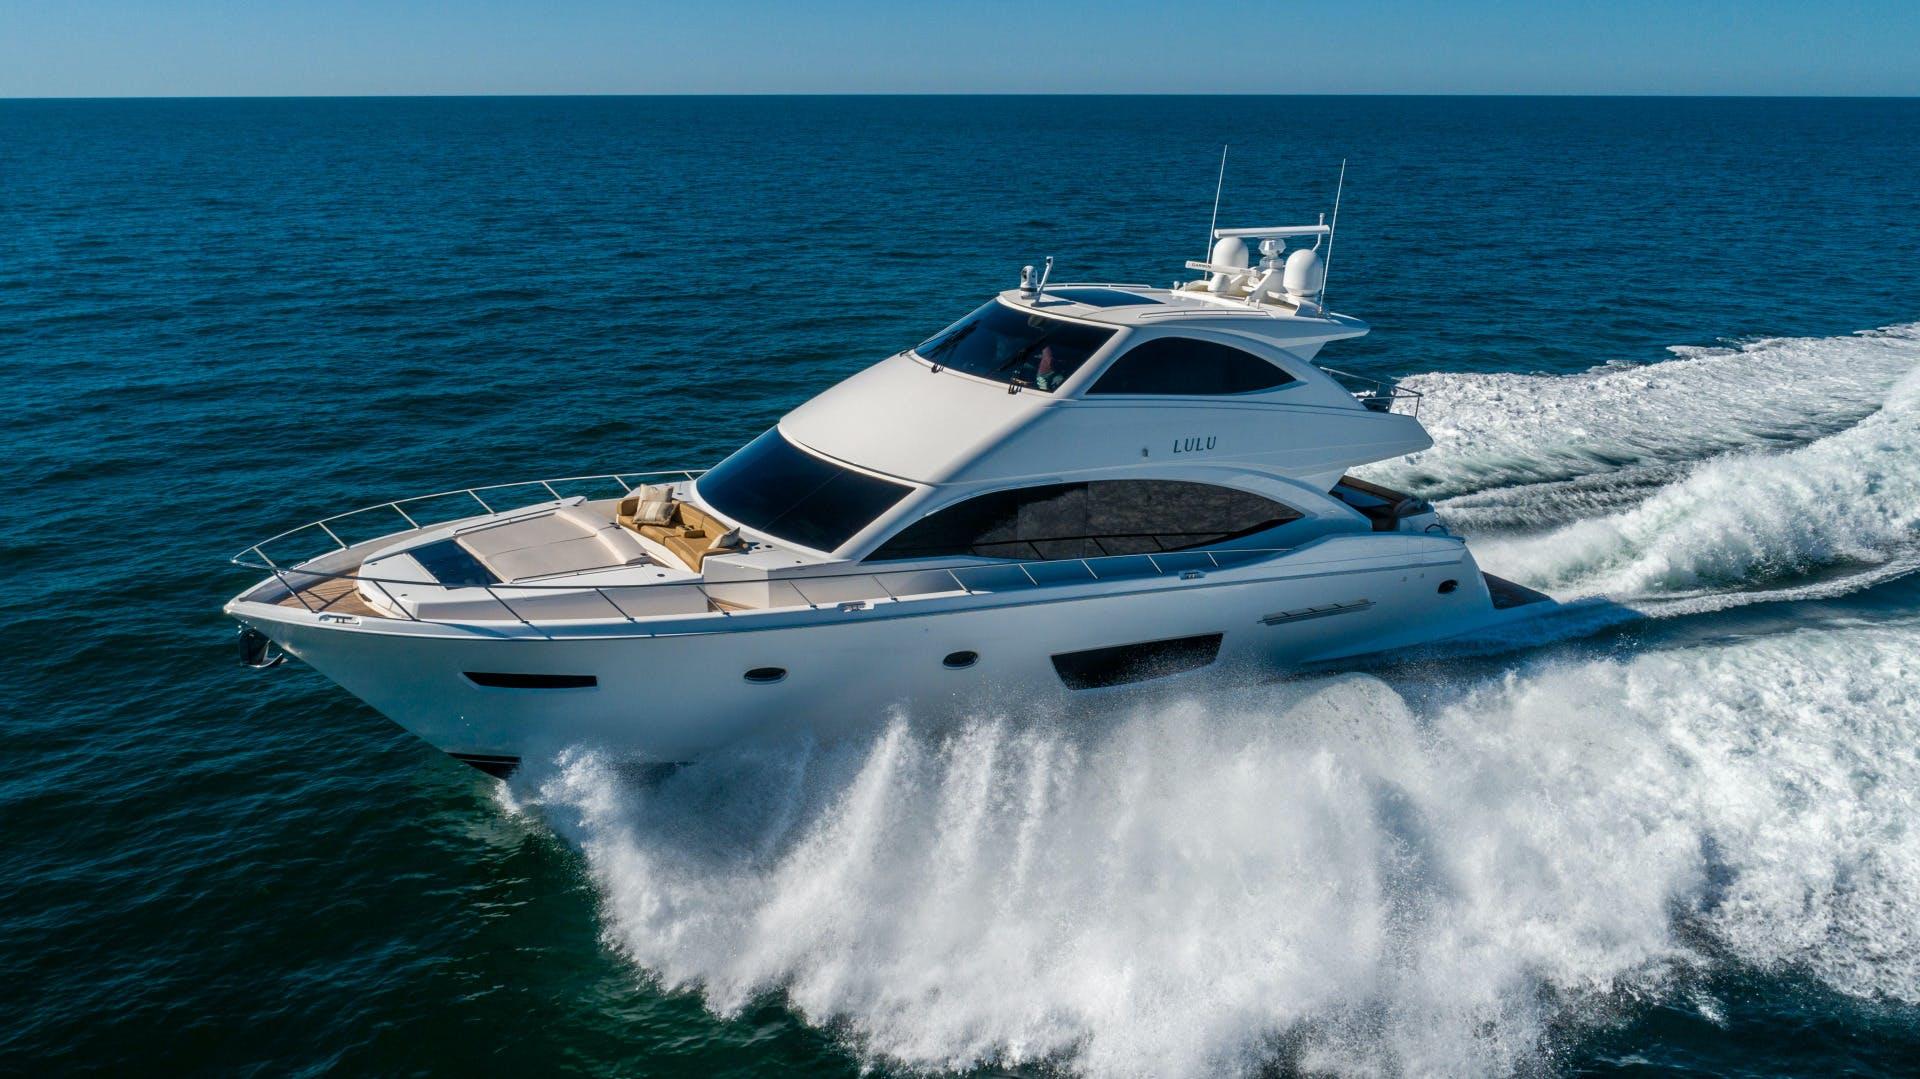 2018 Viking 75' Motor Yacht LULU   Picture 2 of 102